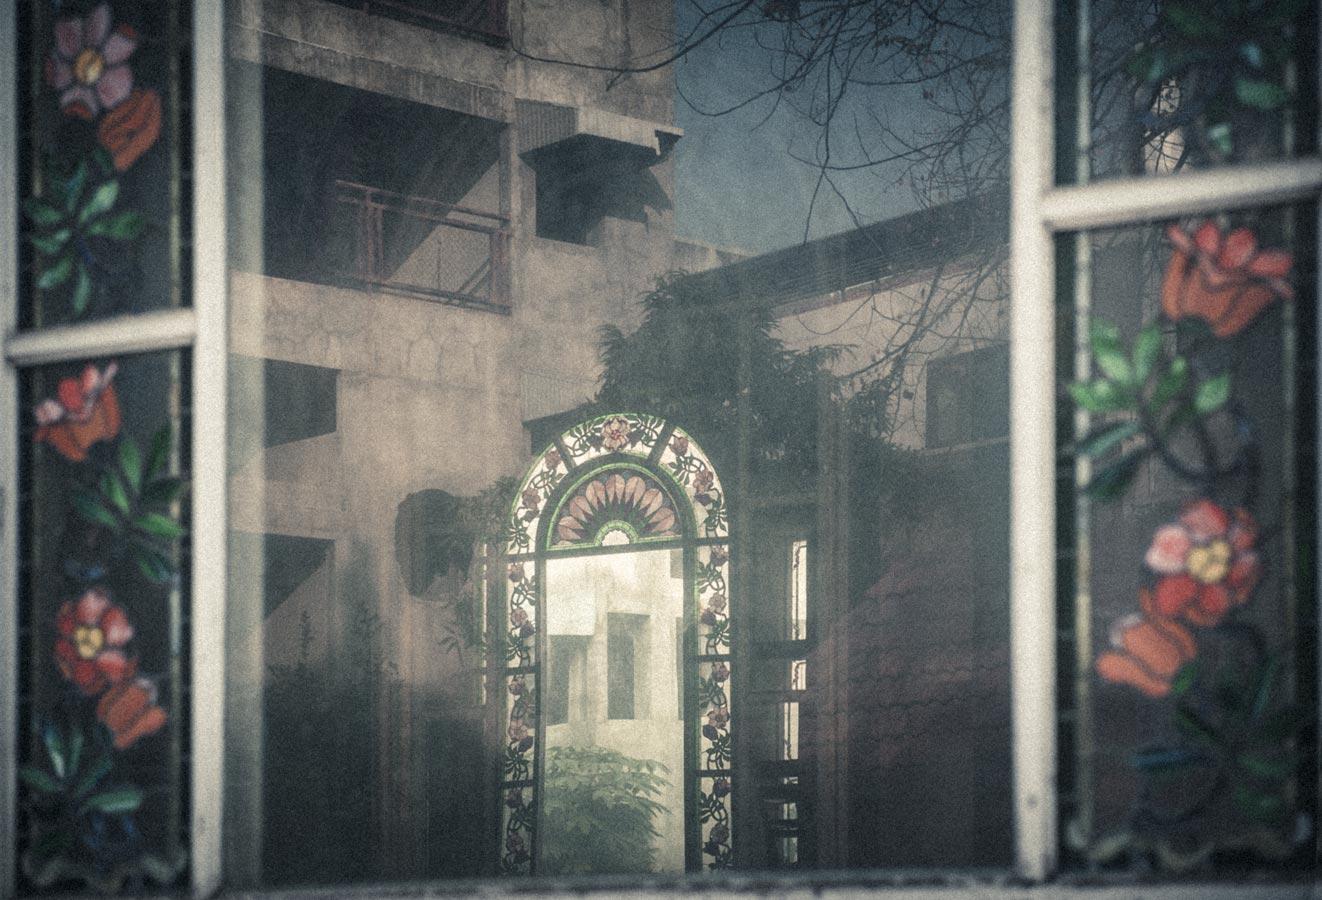 Jamie-Lowe-Photography-Haunted-House-Chiang-Mai-3-2.jpg